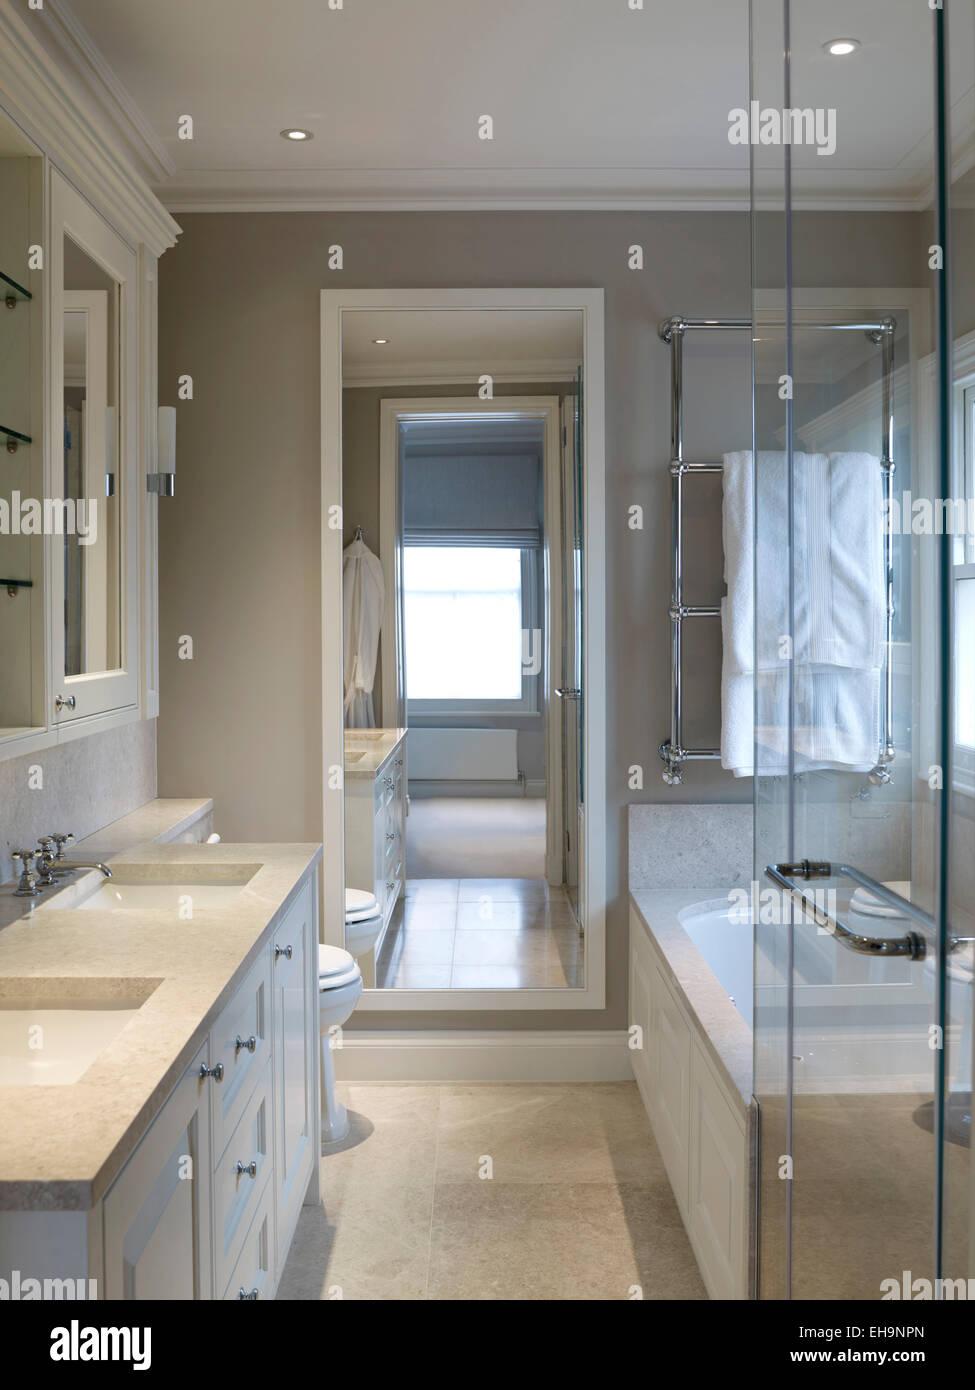 bathroom mirror reflection. Double Basin In Bathroom With Mirror Reflection Edenhurst Road Home, UK 2